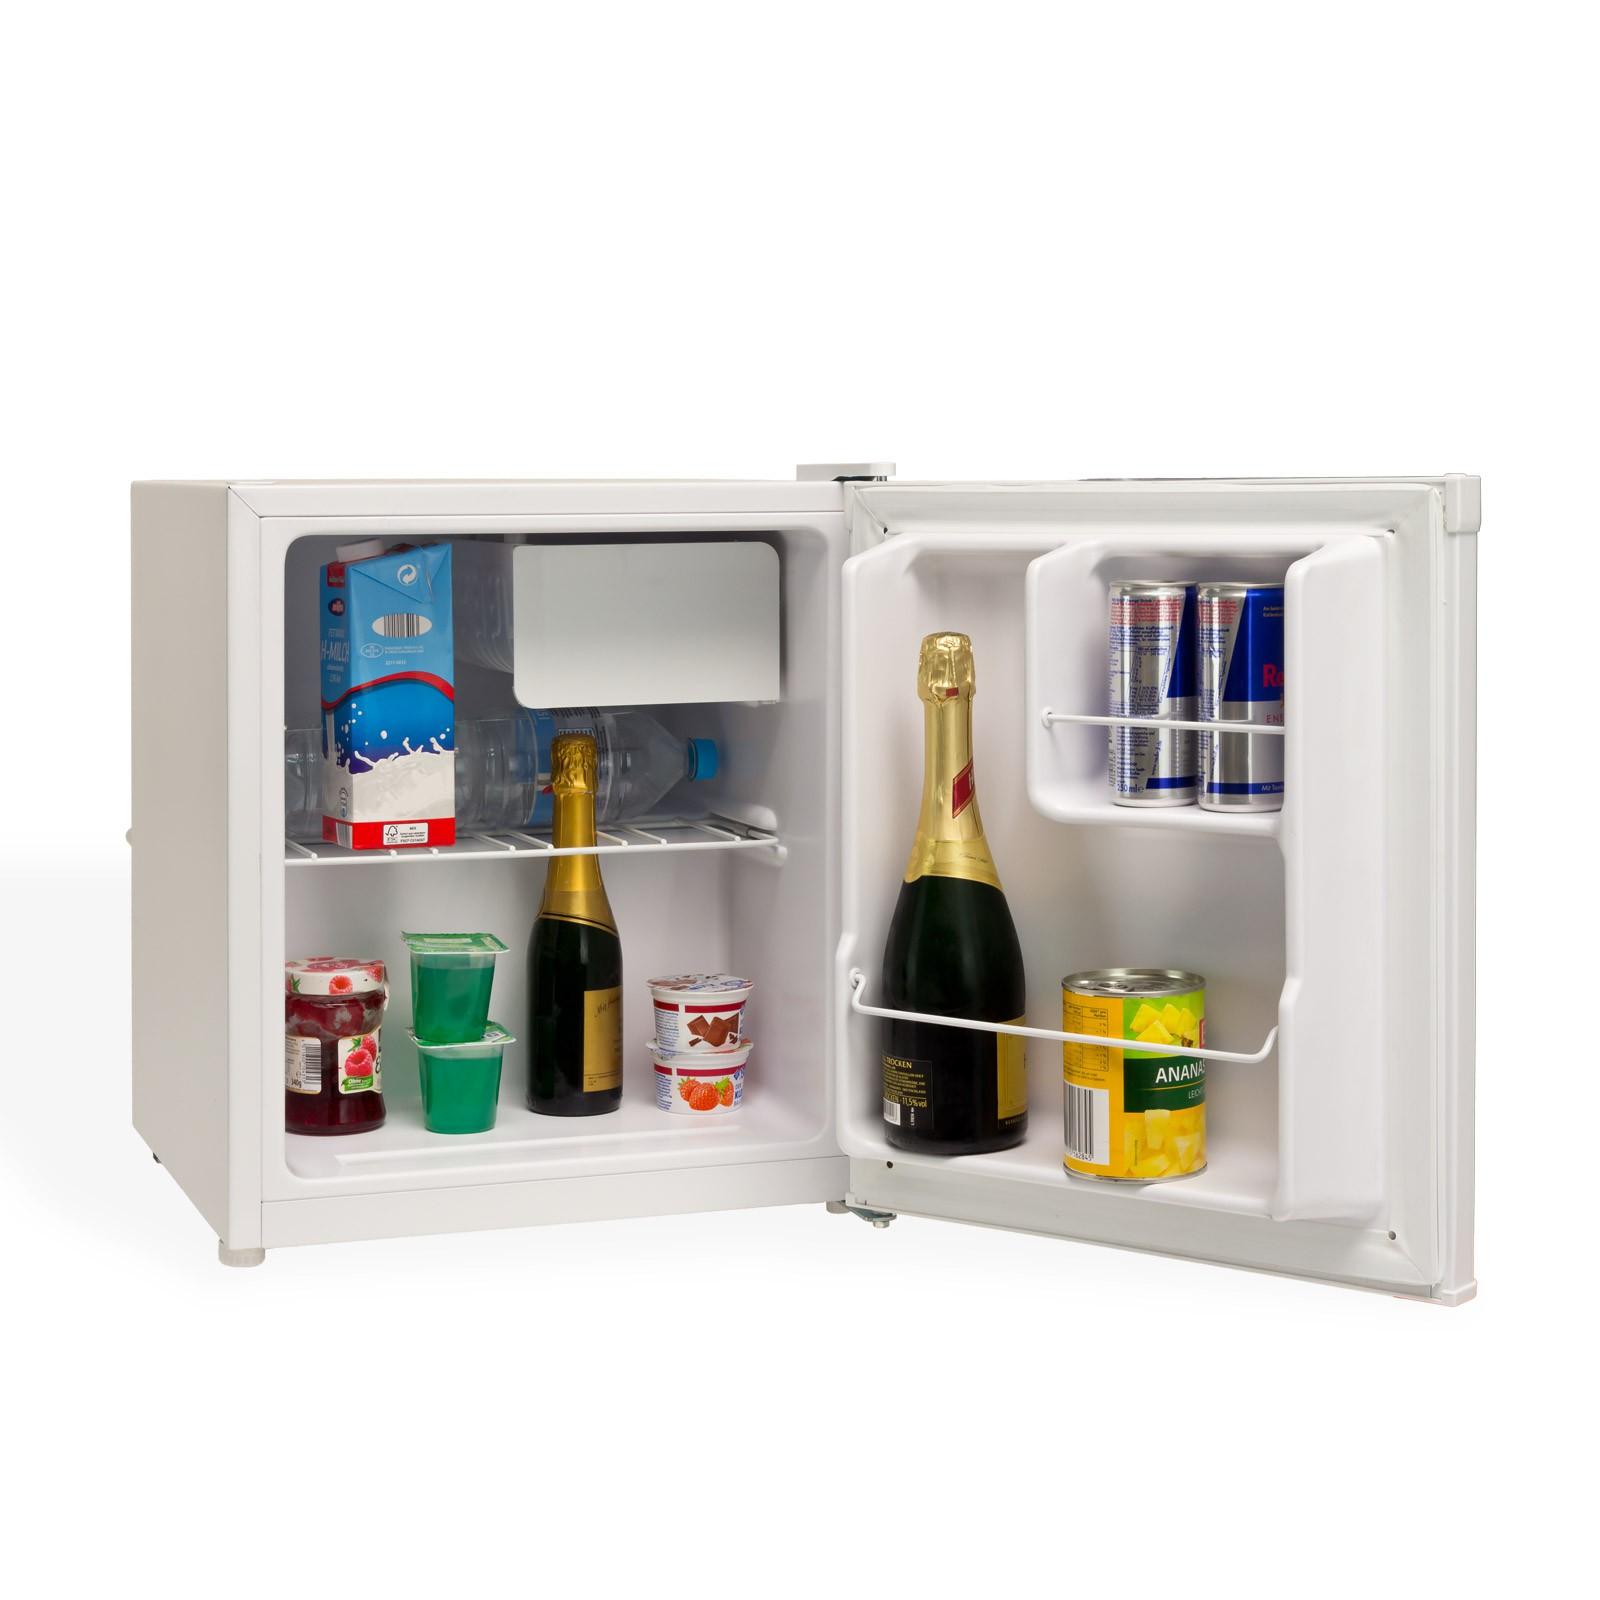 Mini bar kuhlschrank 47l 230 v tischkuhlschrank for Kühlschrank abschlie bar